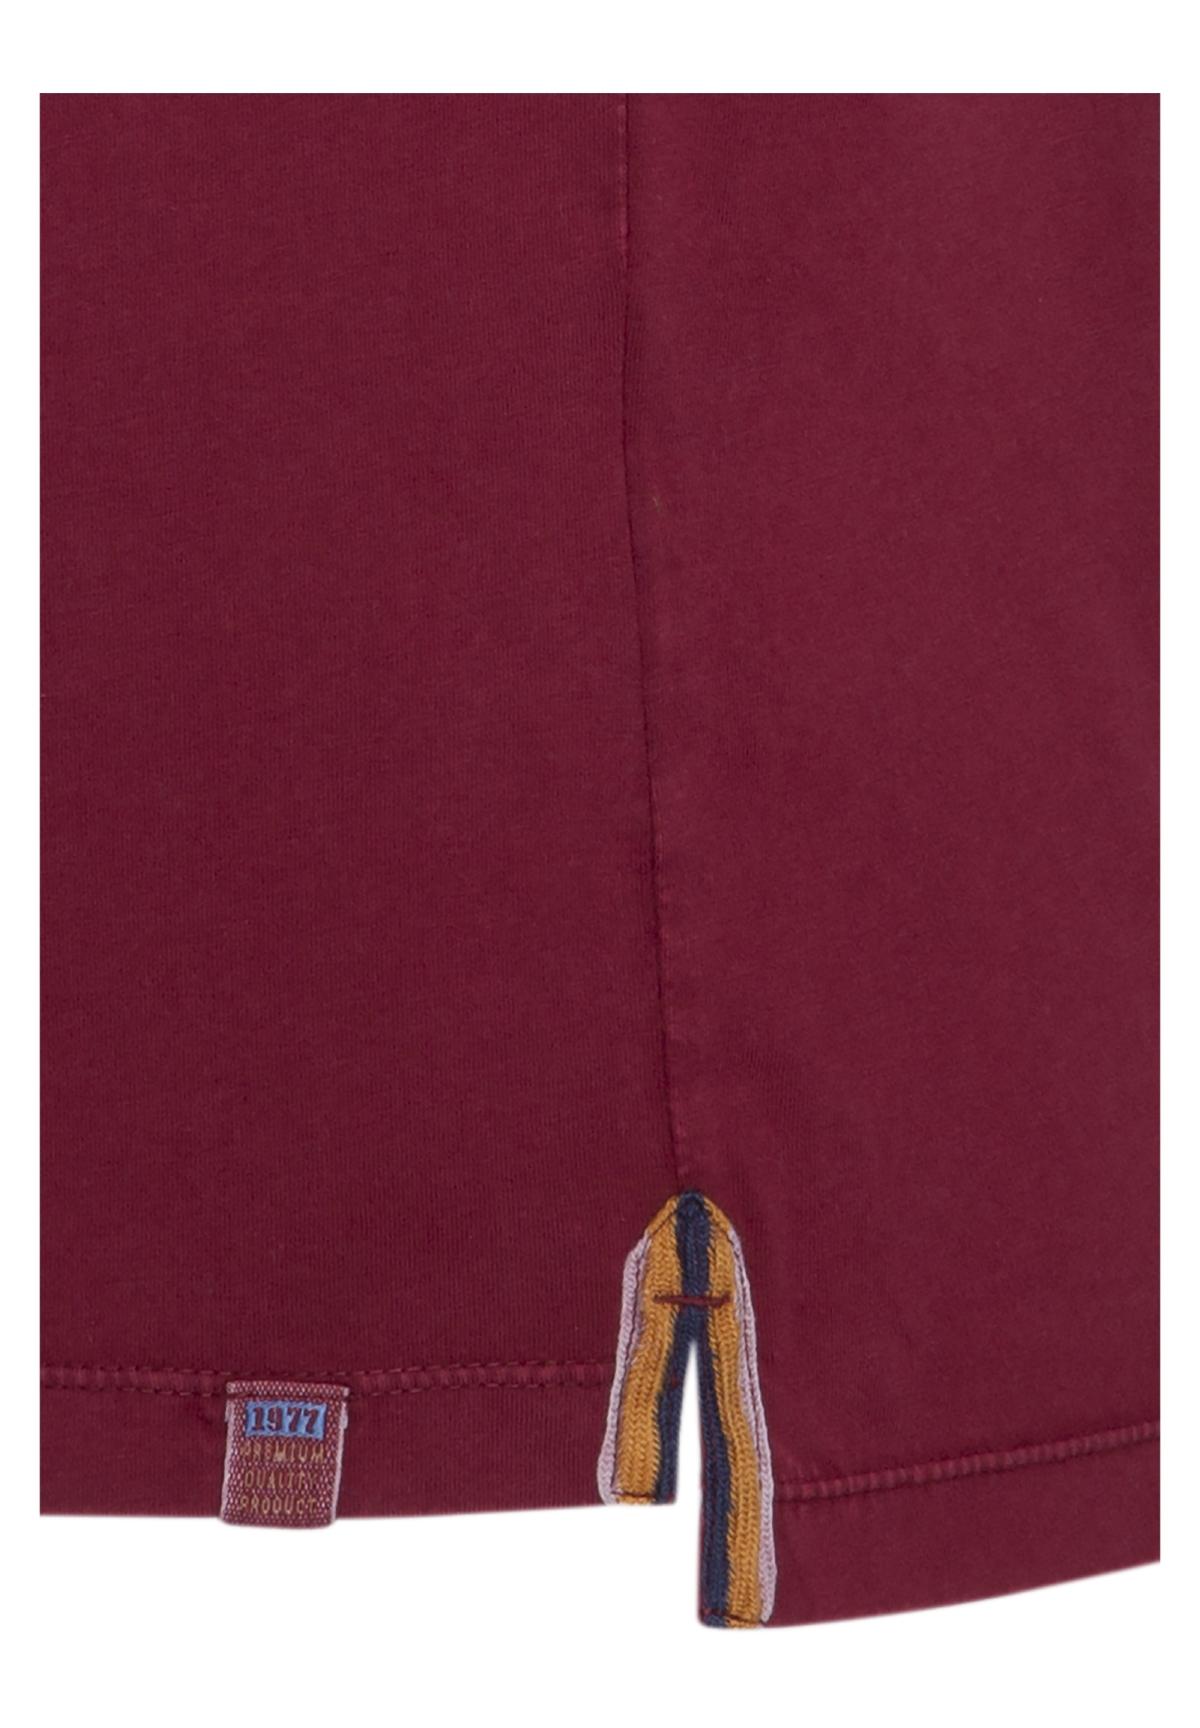 Camel-Active-Herren-Shirt-Poloshirt-Pique-Regular-Fit-NEU Indexbild 59